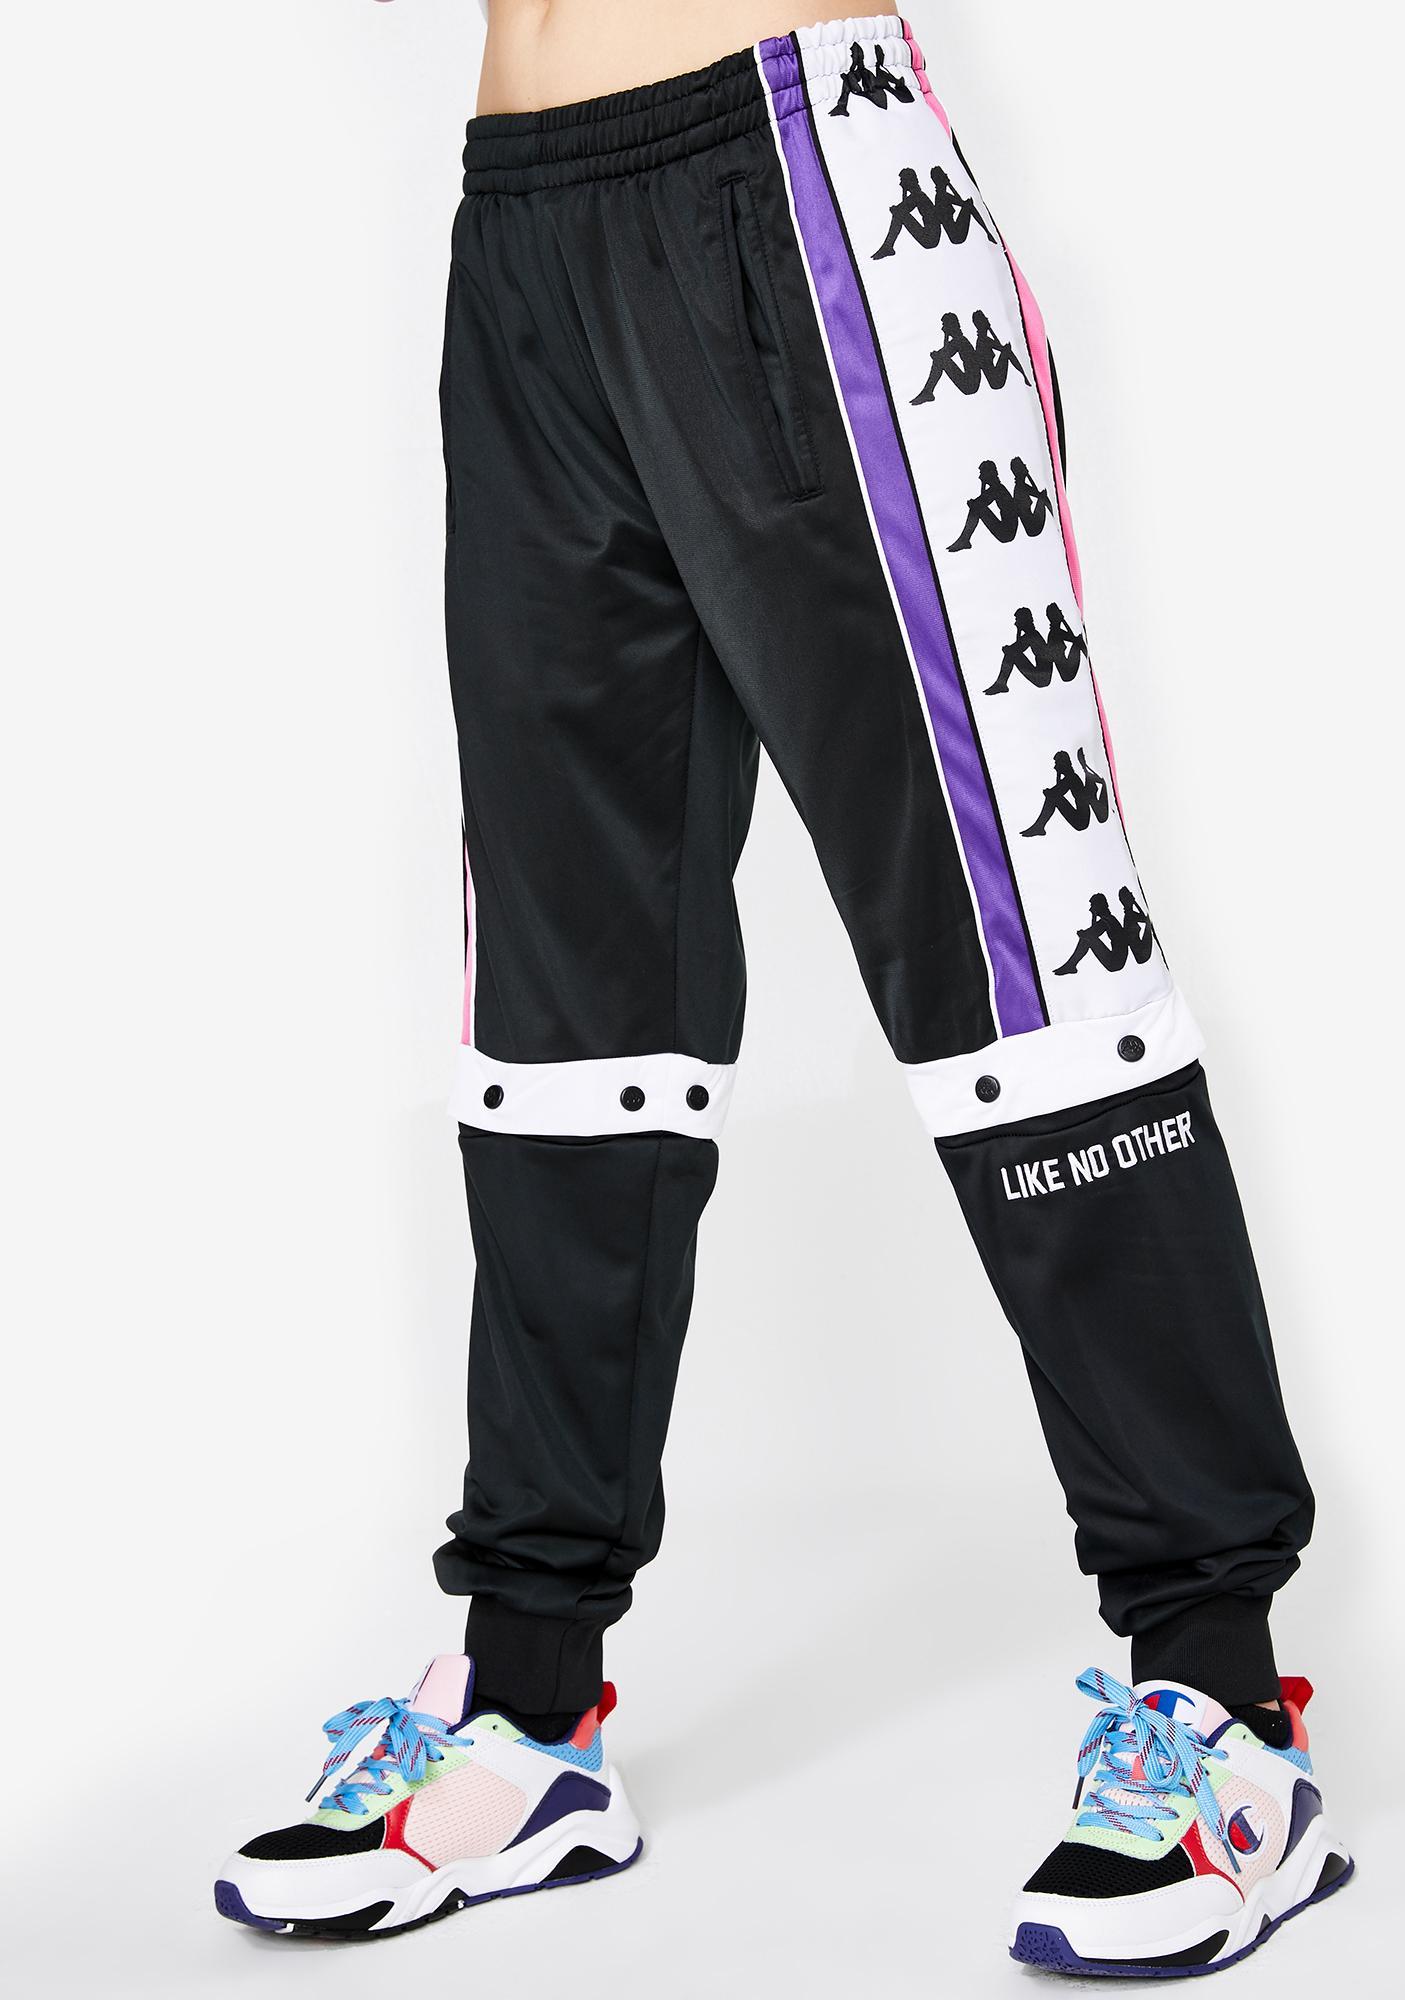 c29750f6b8 Authentic Bilby Track Pants